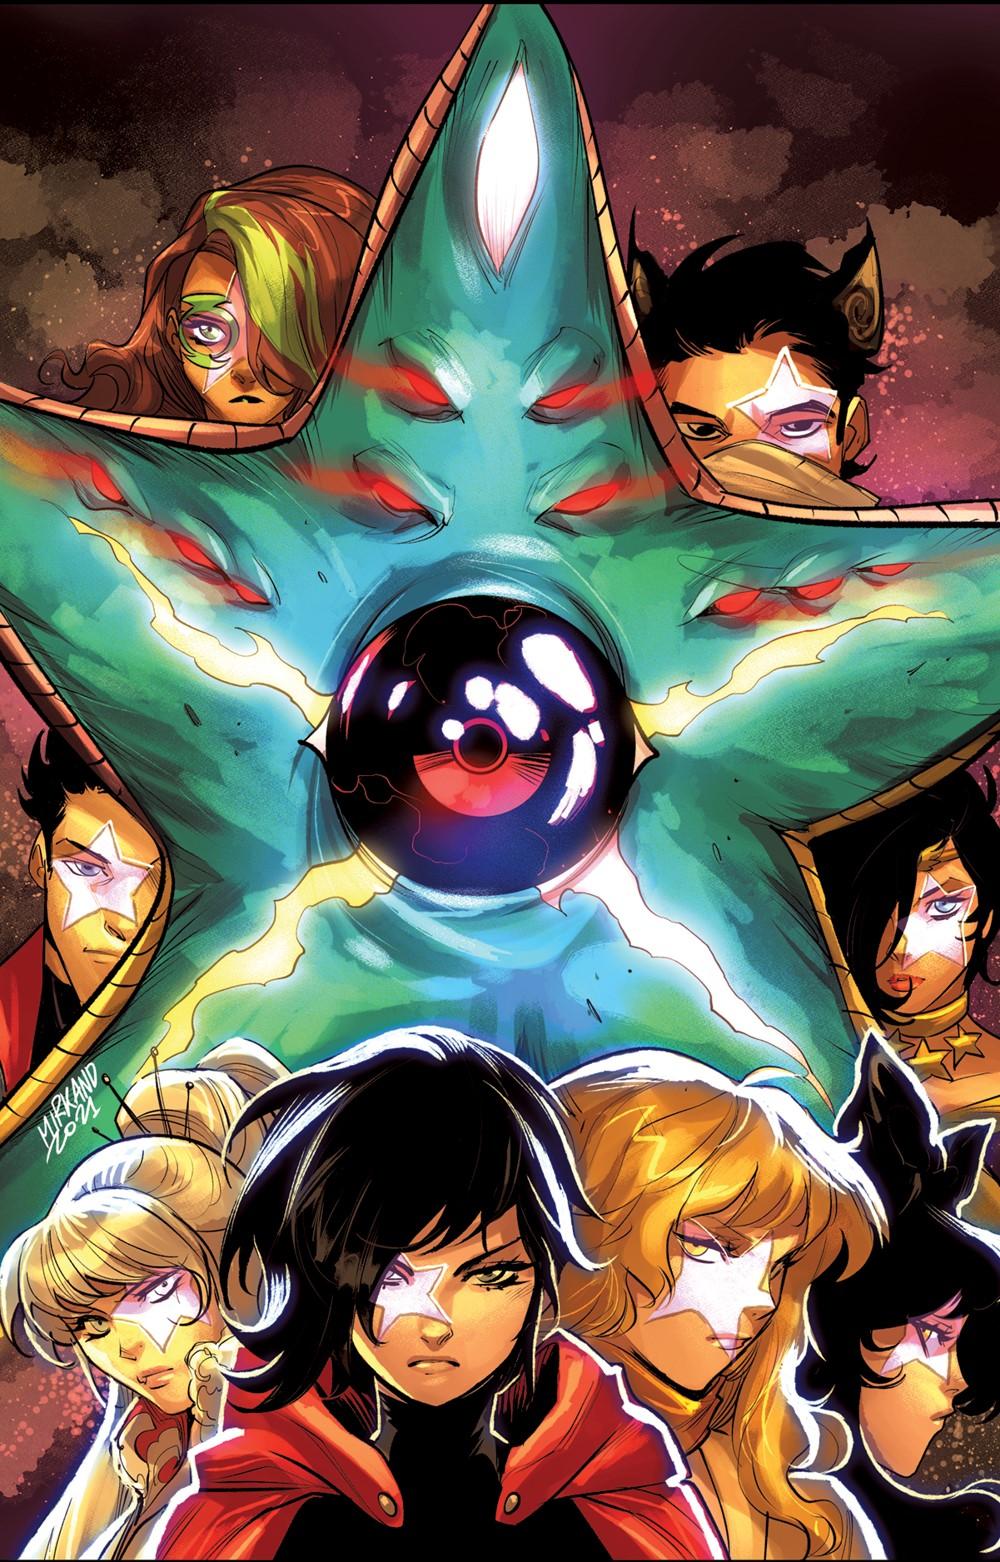 RWBY-JL-7-Main DC Comics October 2021 Solicitations